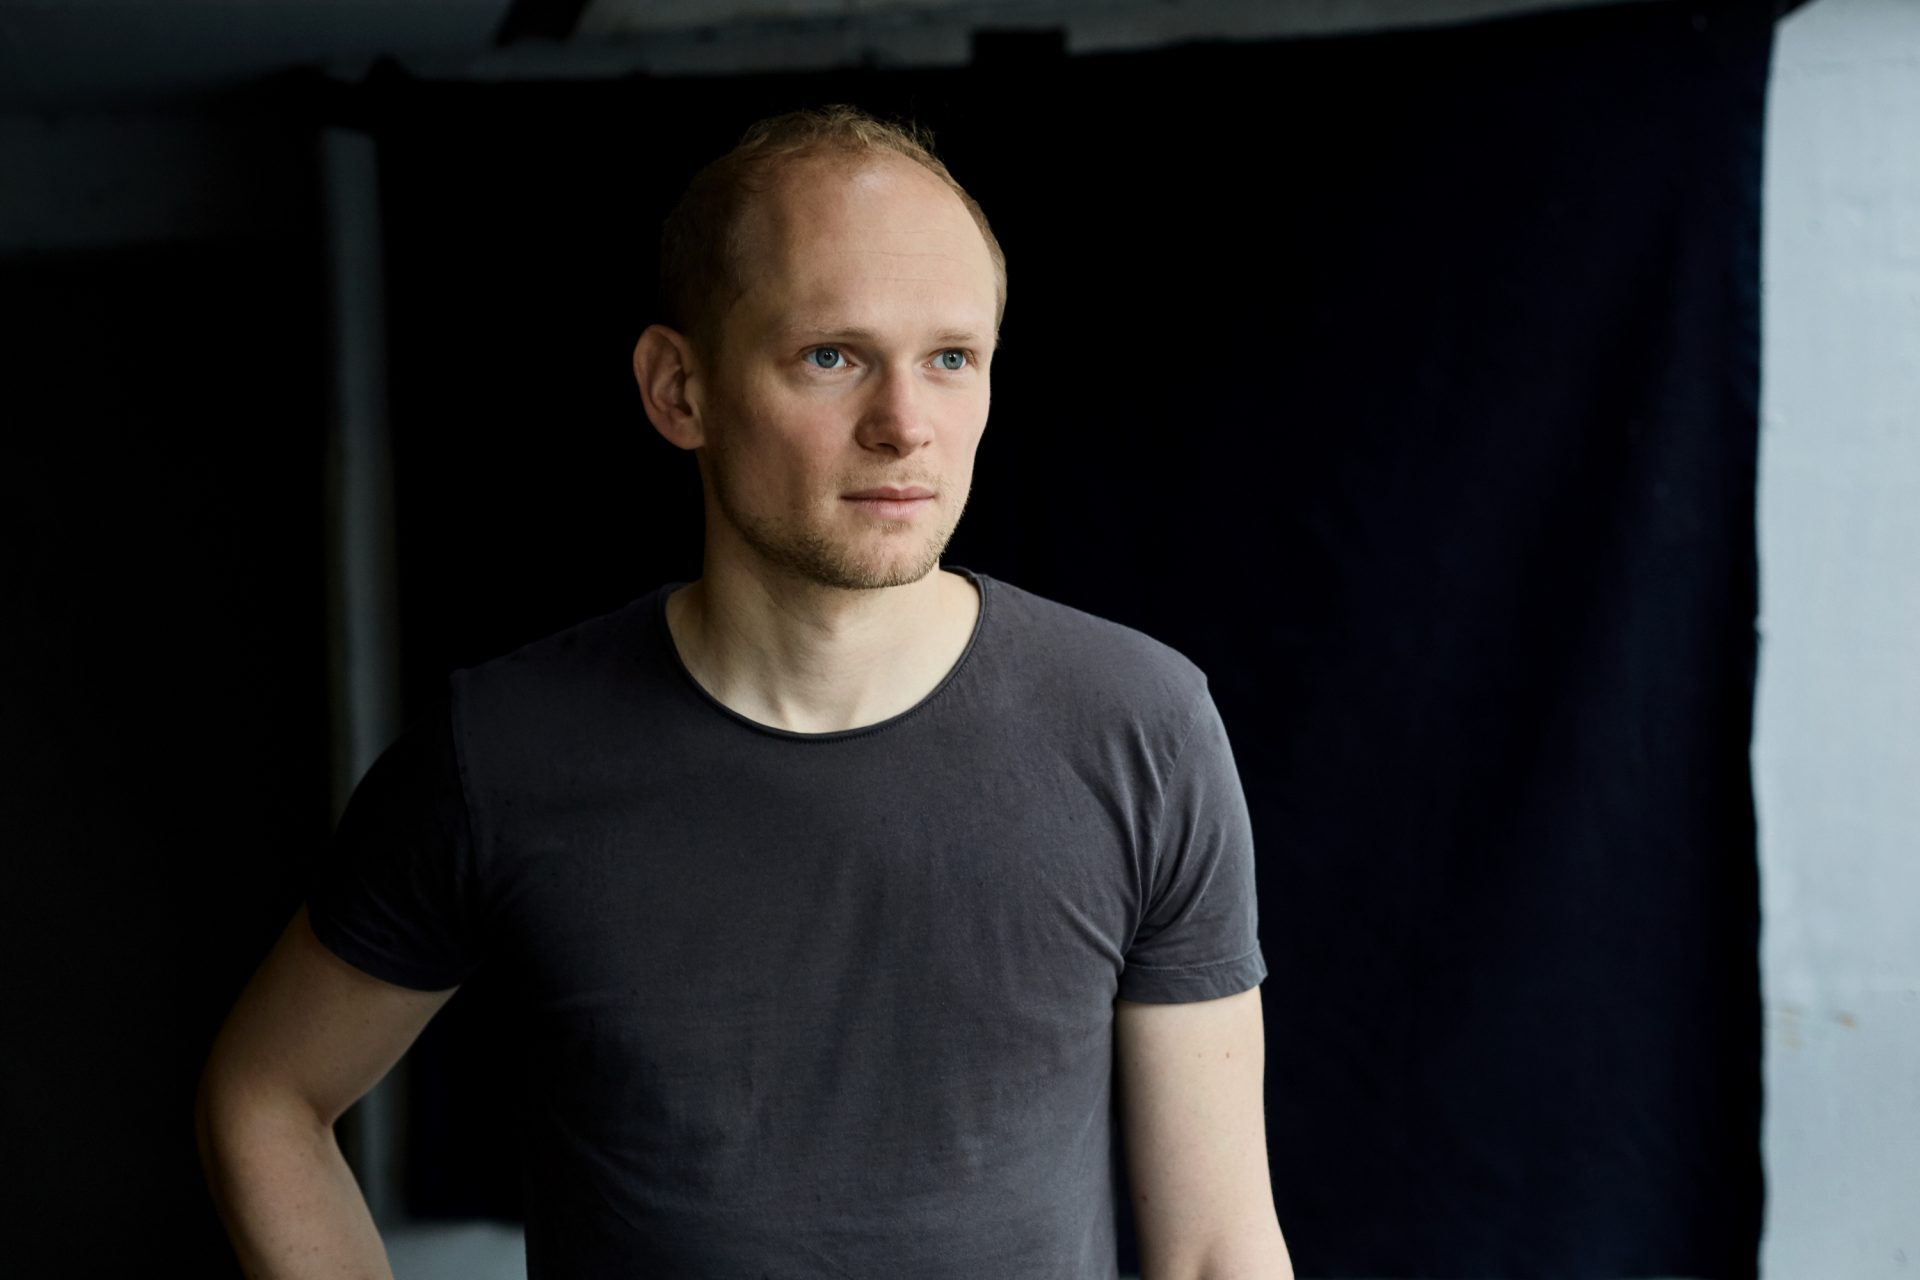 Bernhard Conrad